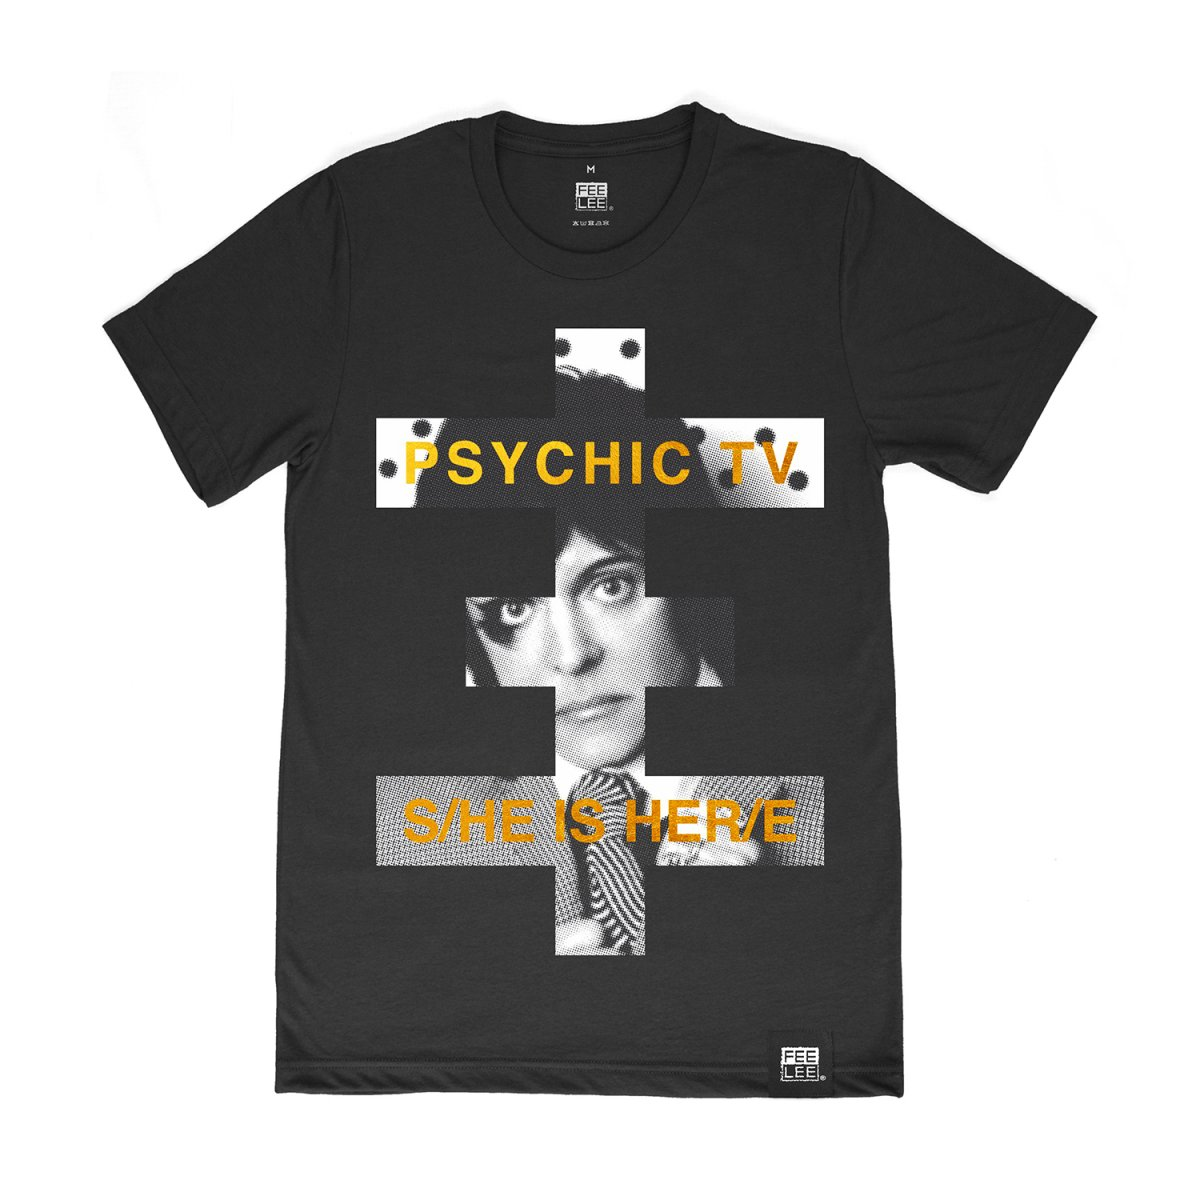 Футболка «Psychic TV». Черная